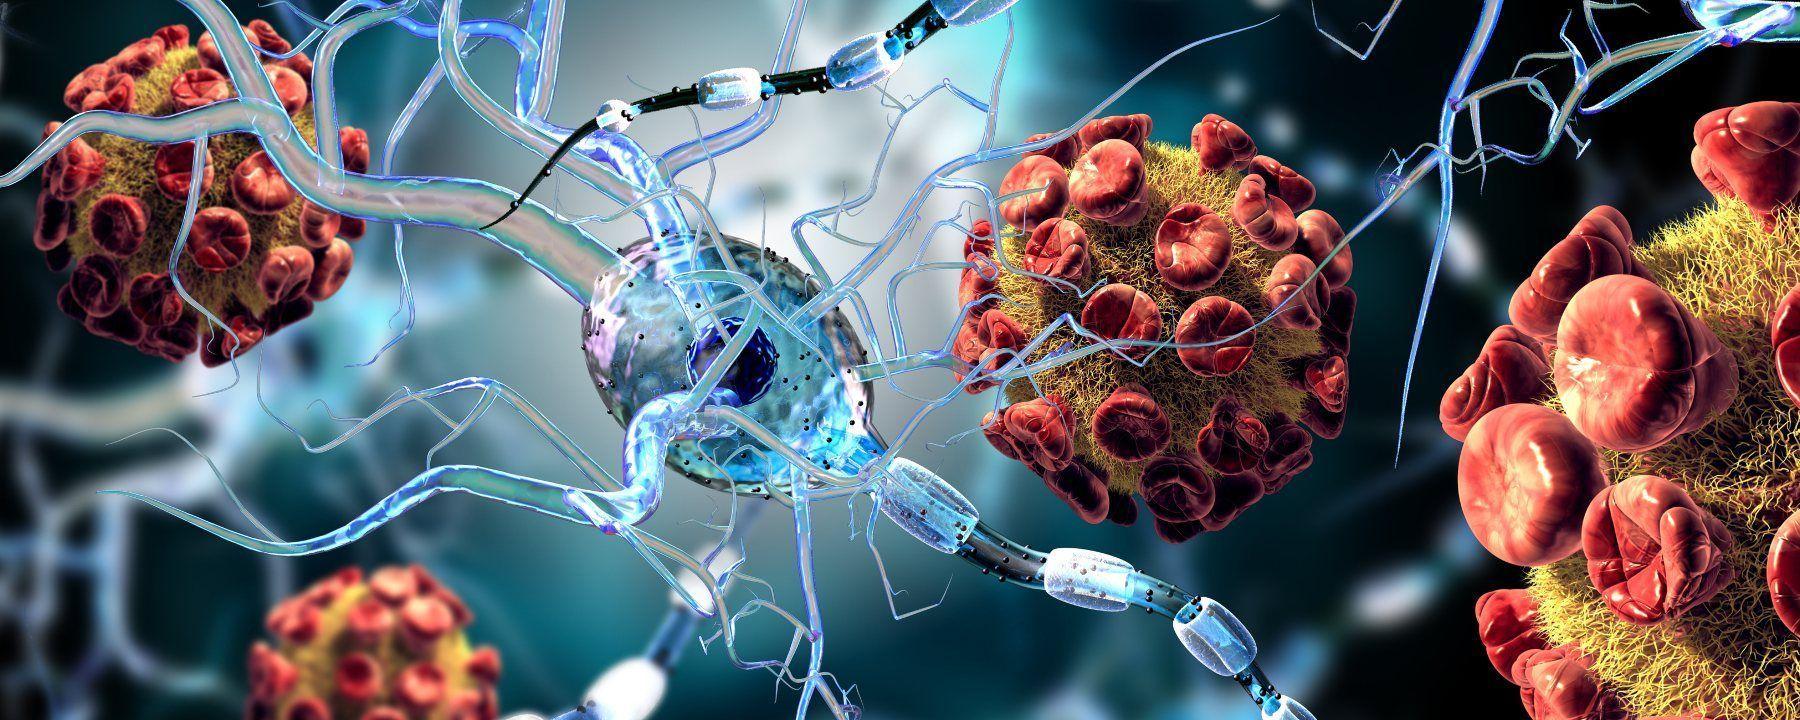 Коронавирус негативно влияет на нервную систему